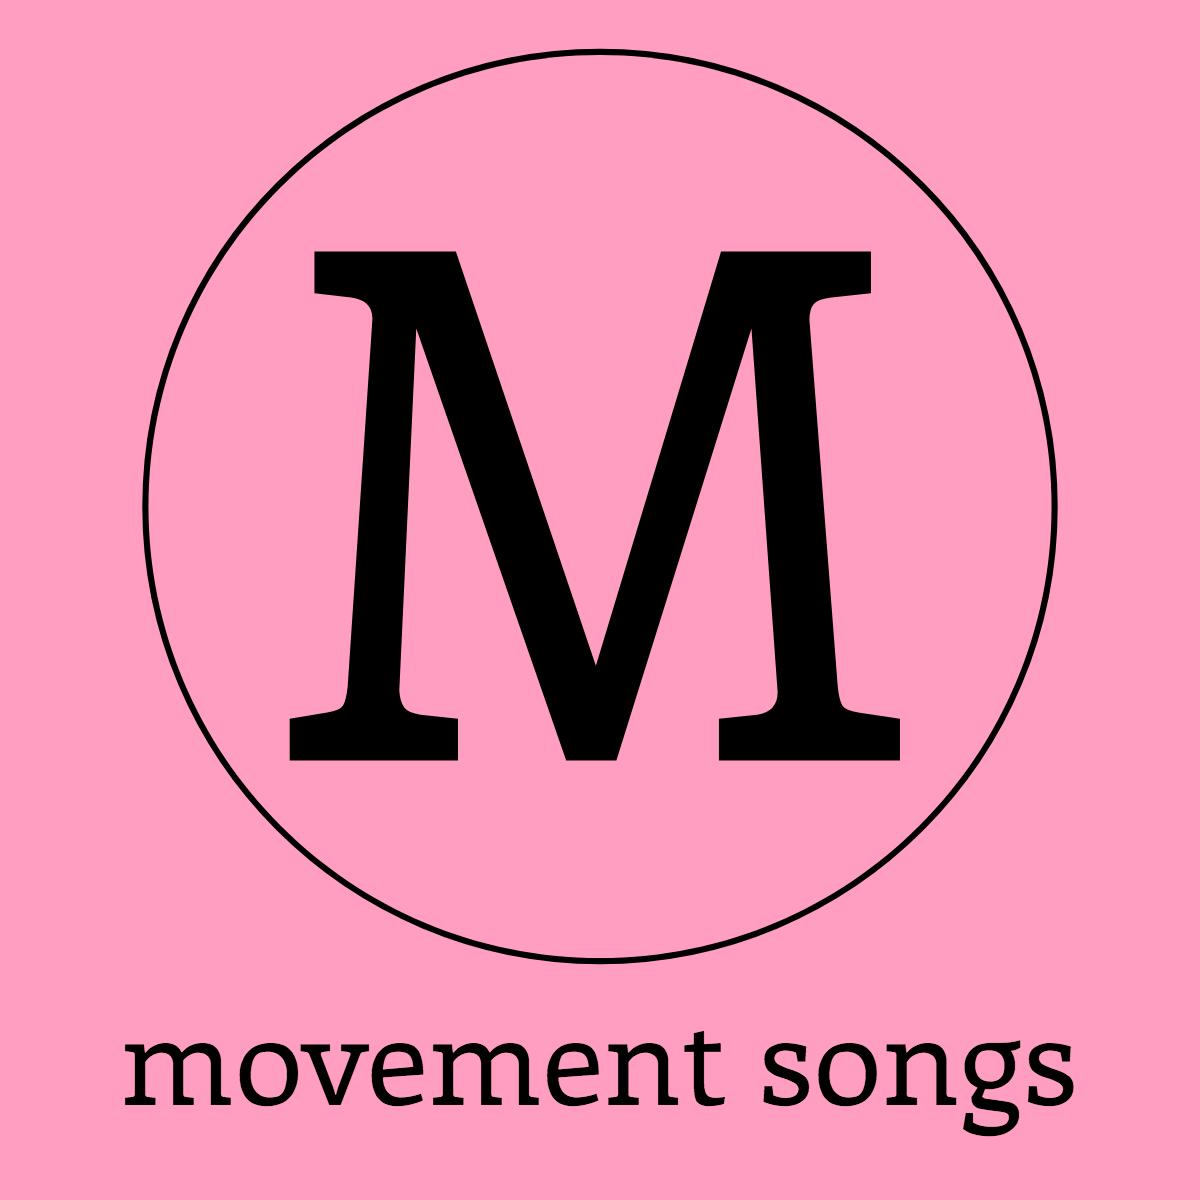 movement songs.jpg